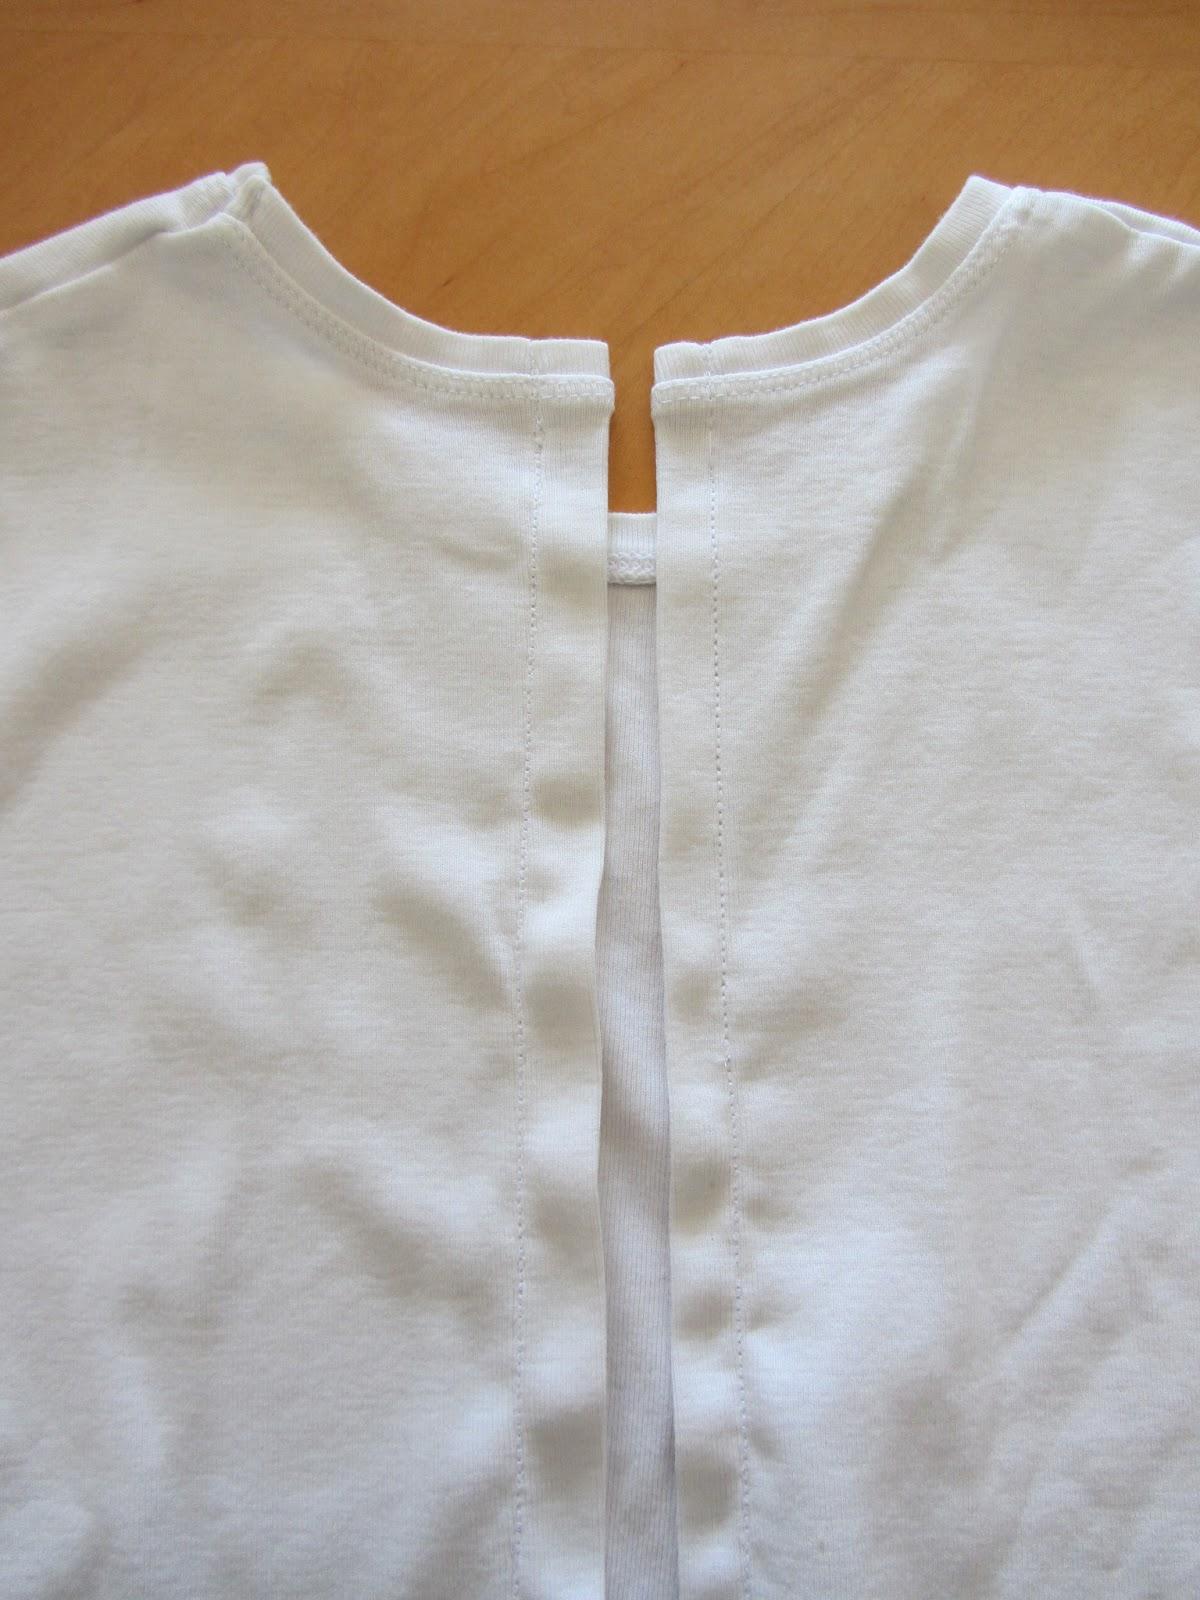 Refashion Co-op: Spring t-shirt refashion #2 - bows